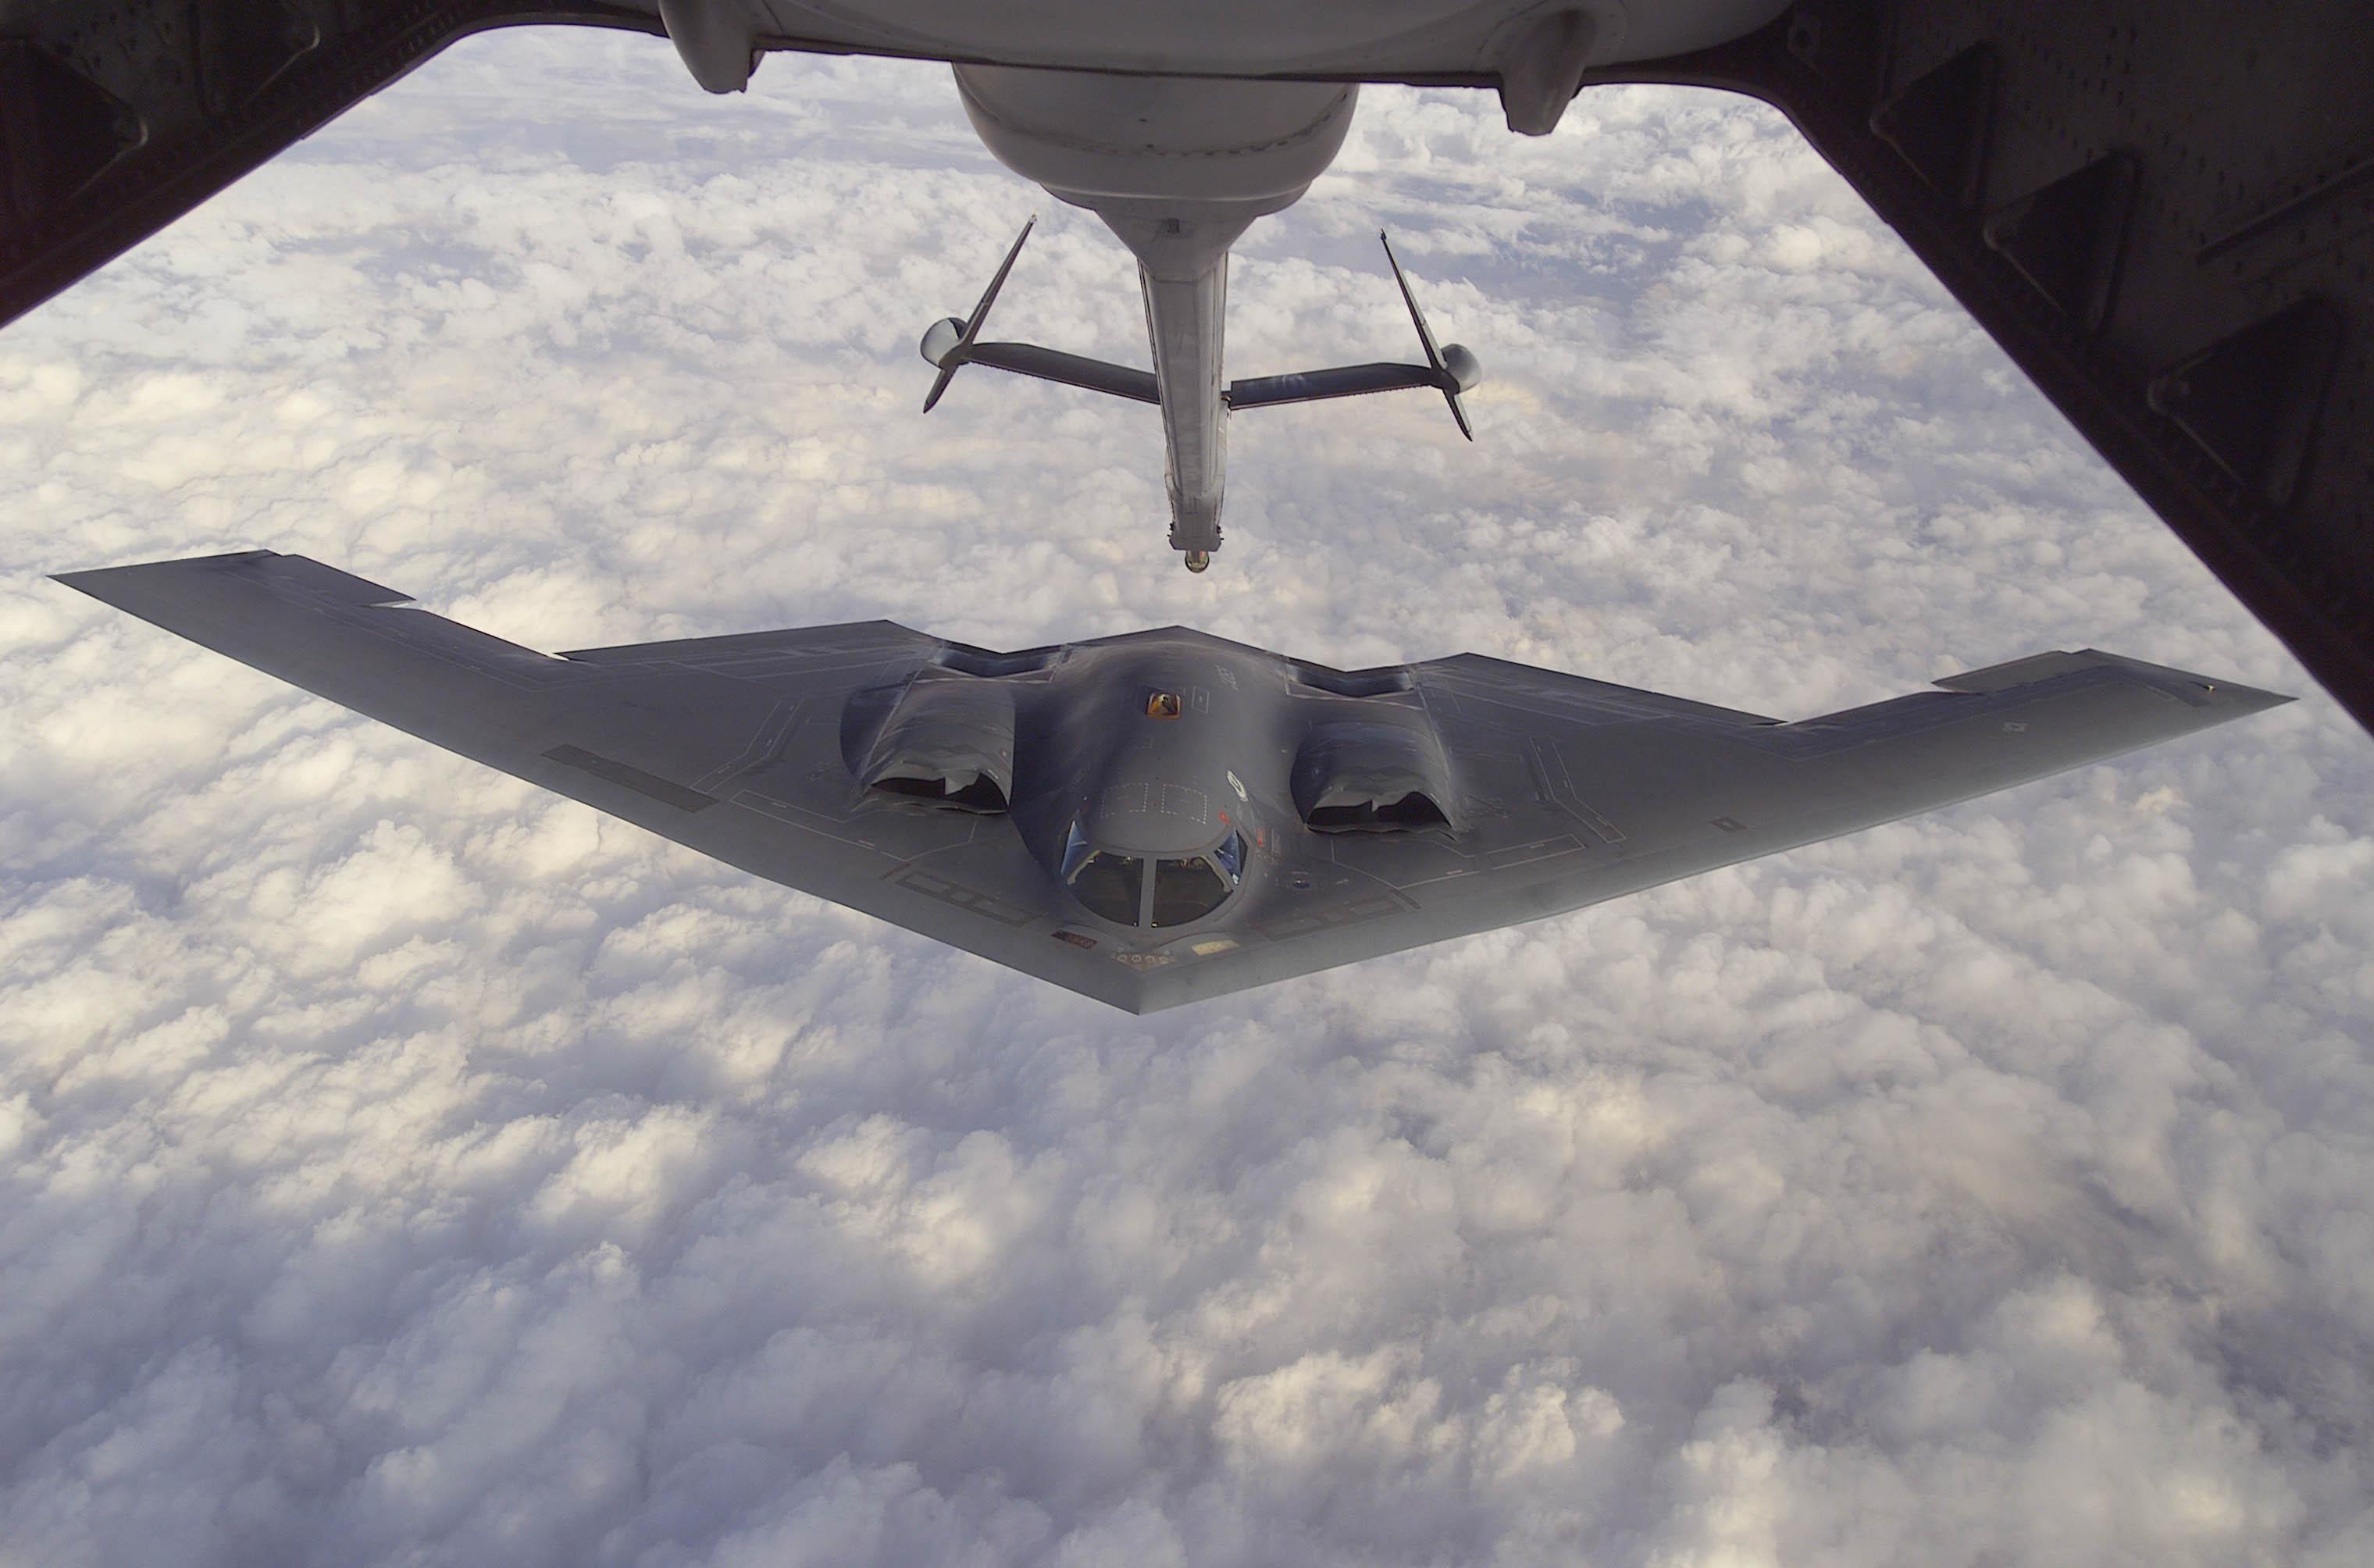 Northrop Grumman B 2 Spirit Wallpaper 13   3040 X 2008 stmednet 3040x2008